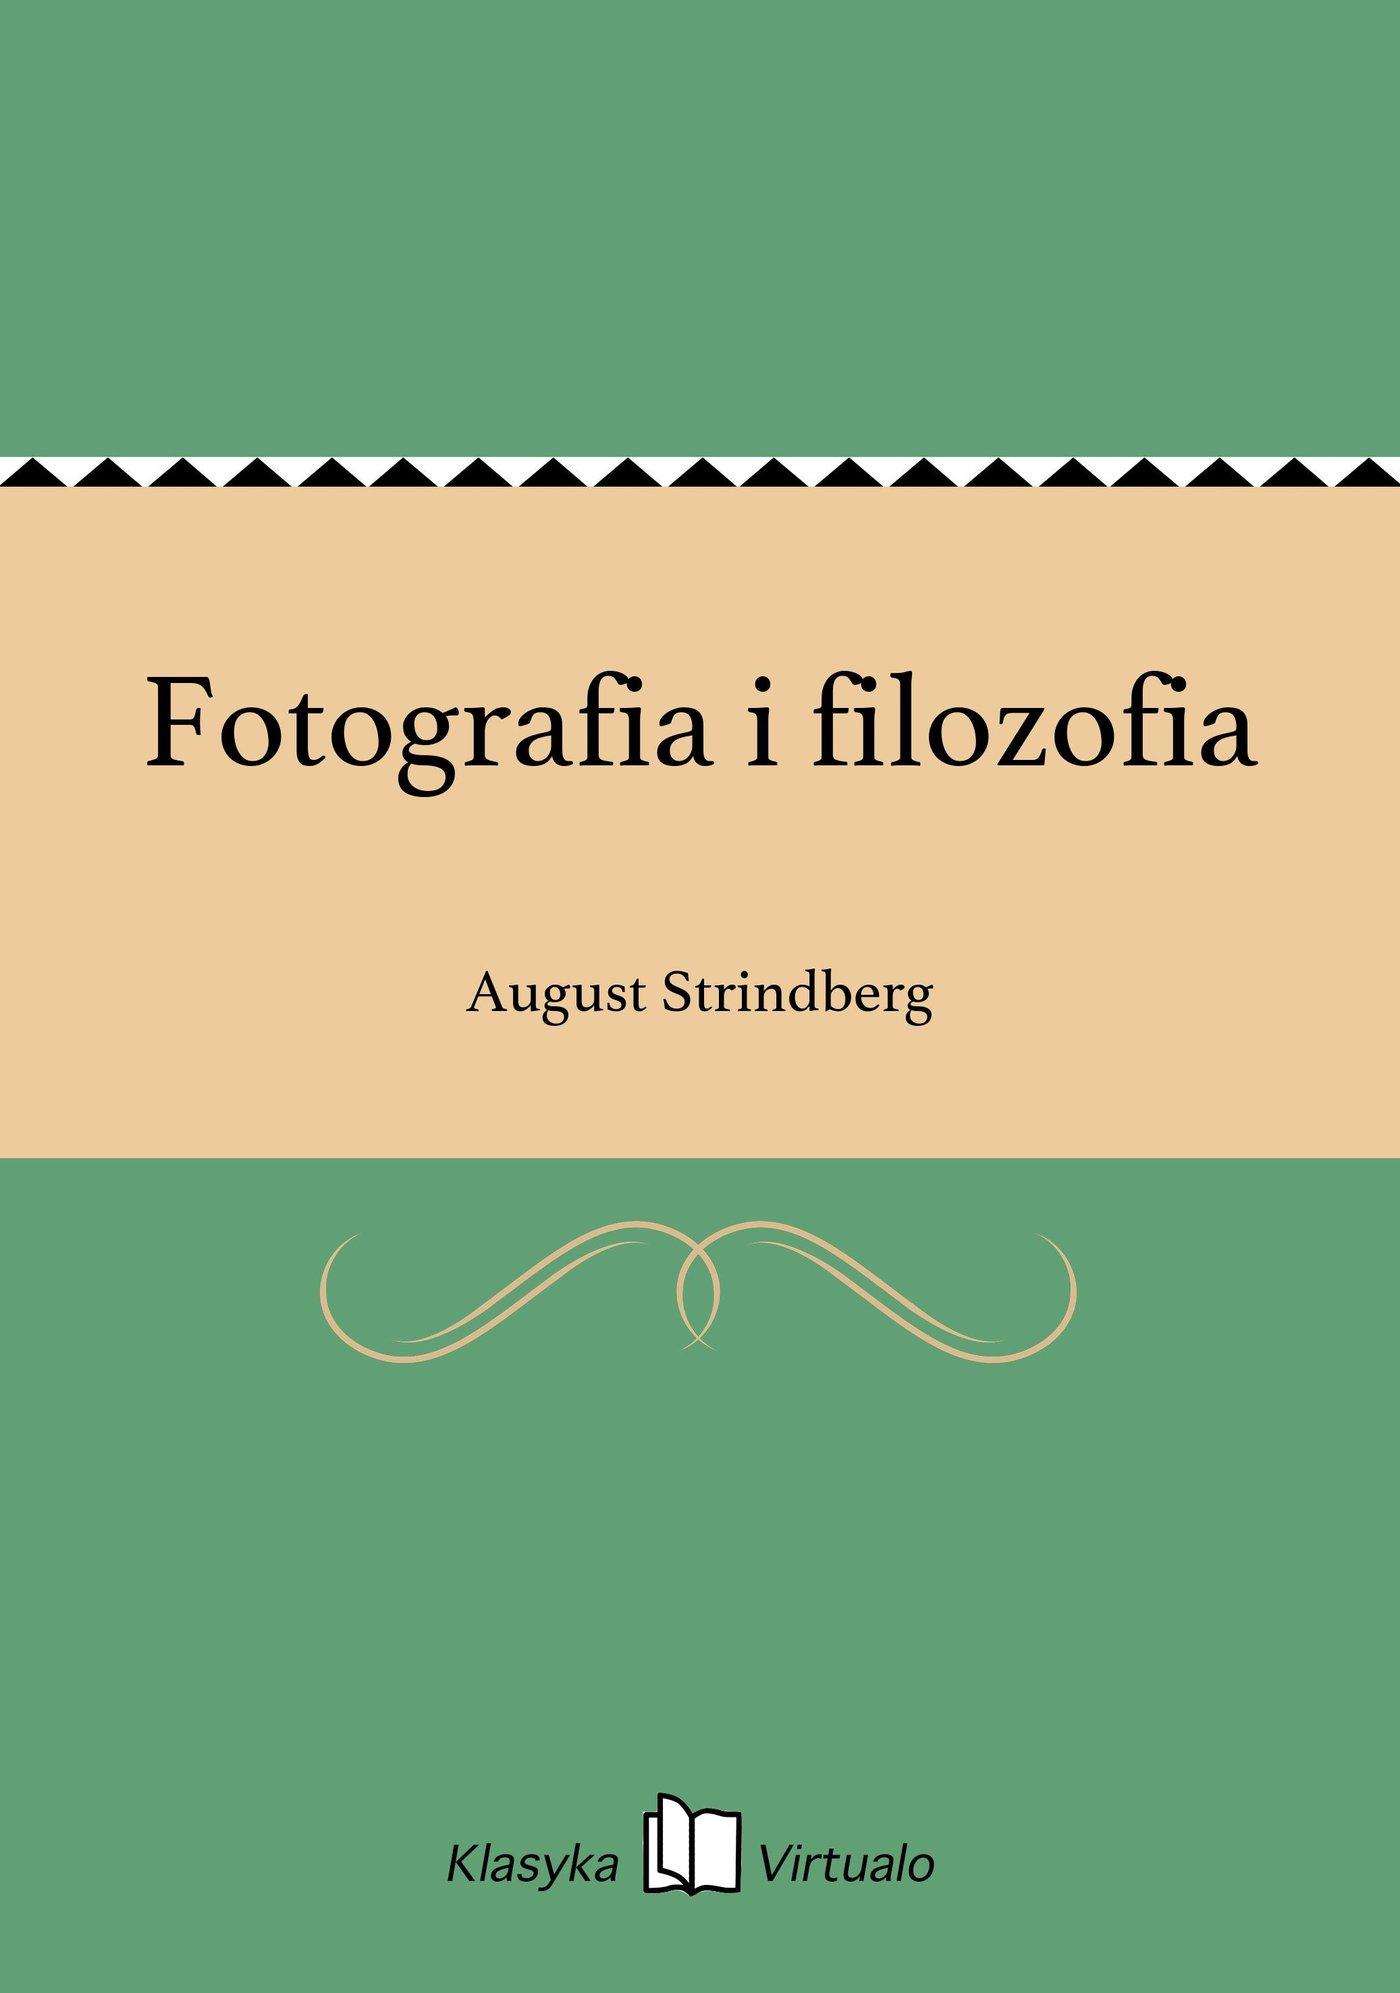 Fotografia i filozofia - Ebook (Książka na Kindle) do pobrania w formacie MOBI